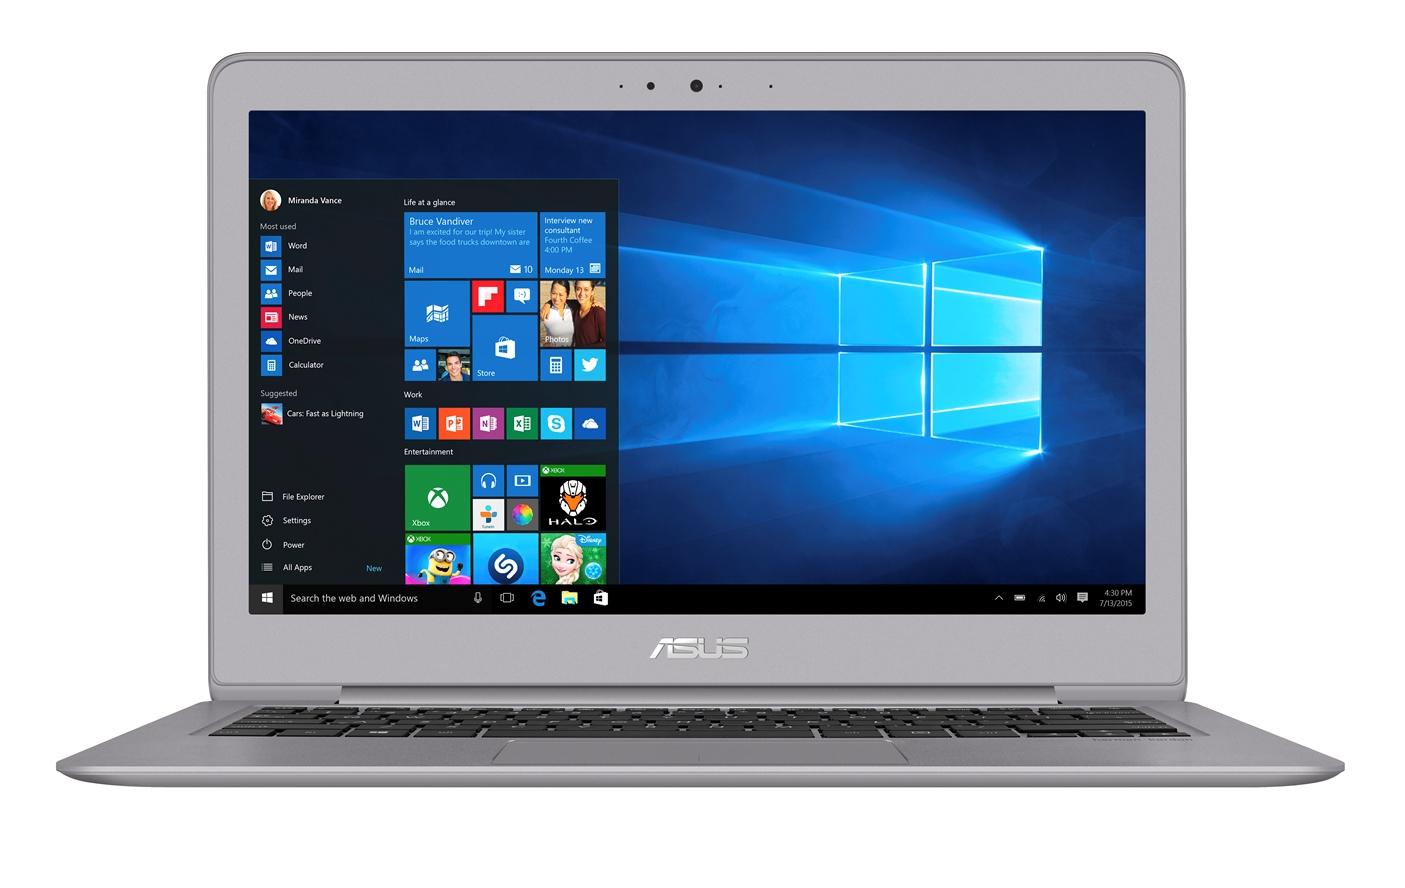 "ASUS UX330UA-FB114T i5-7500U/8G/256G SSD SATA3/UMA/13,3"" IPS/QHD+/W10/Grey"